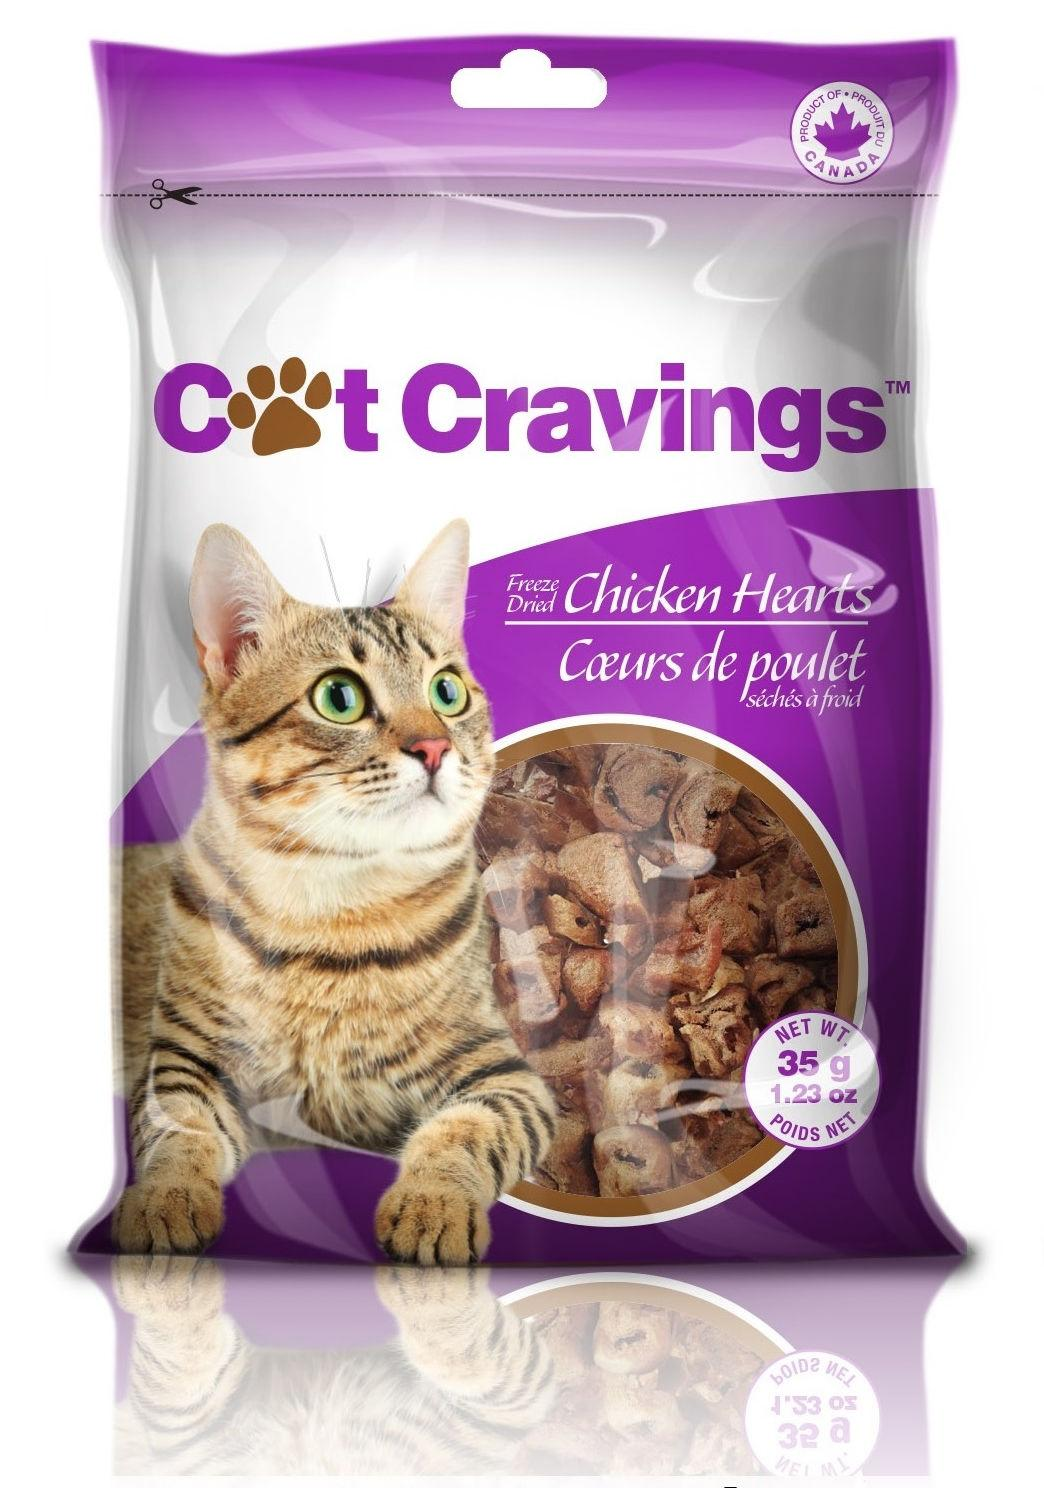 Petz International Cat Cravings Chicken Hearts Freeze-Dried Cat Treats, 35-gram